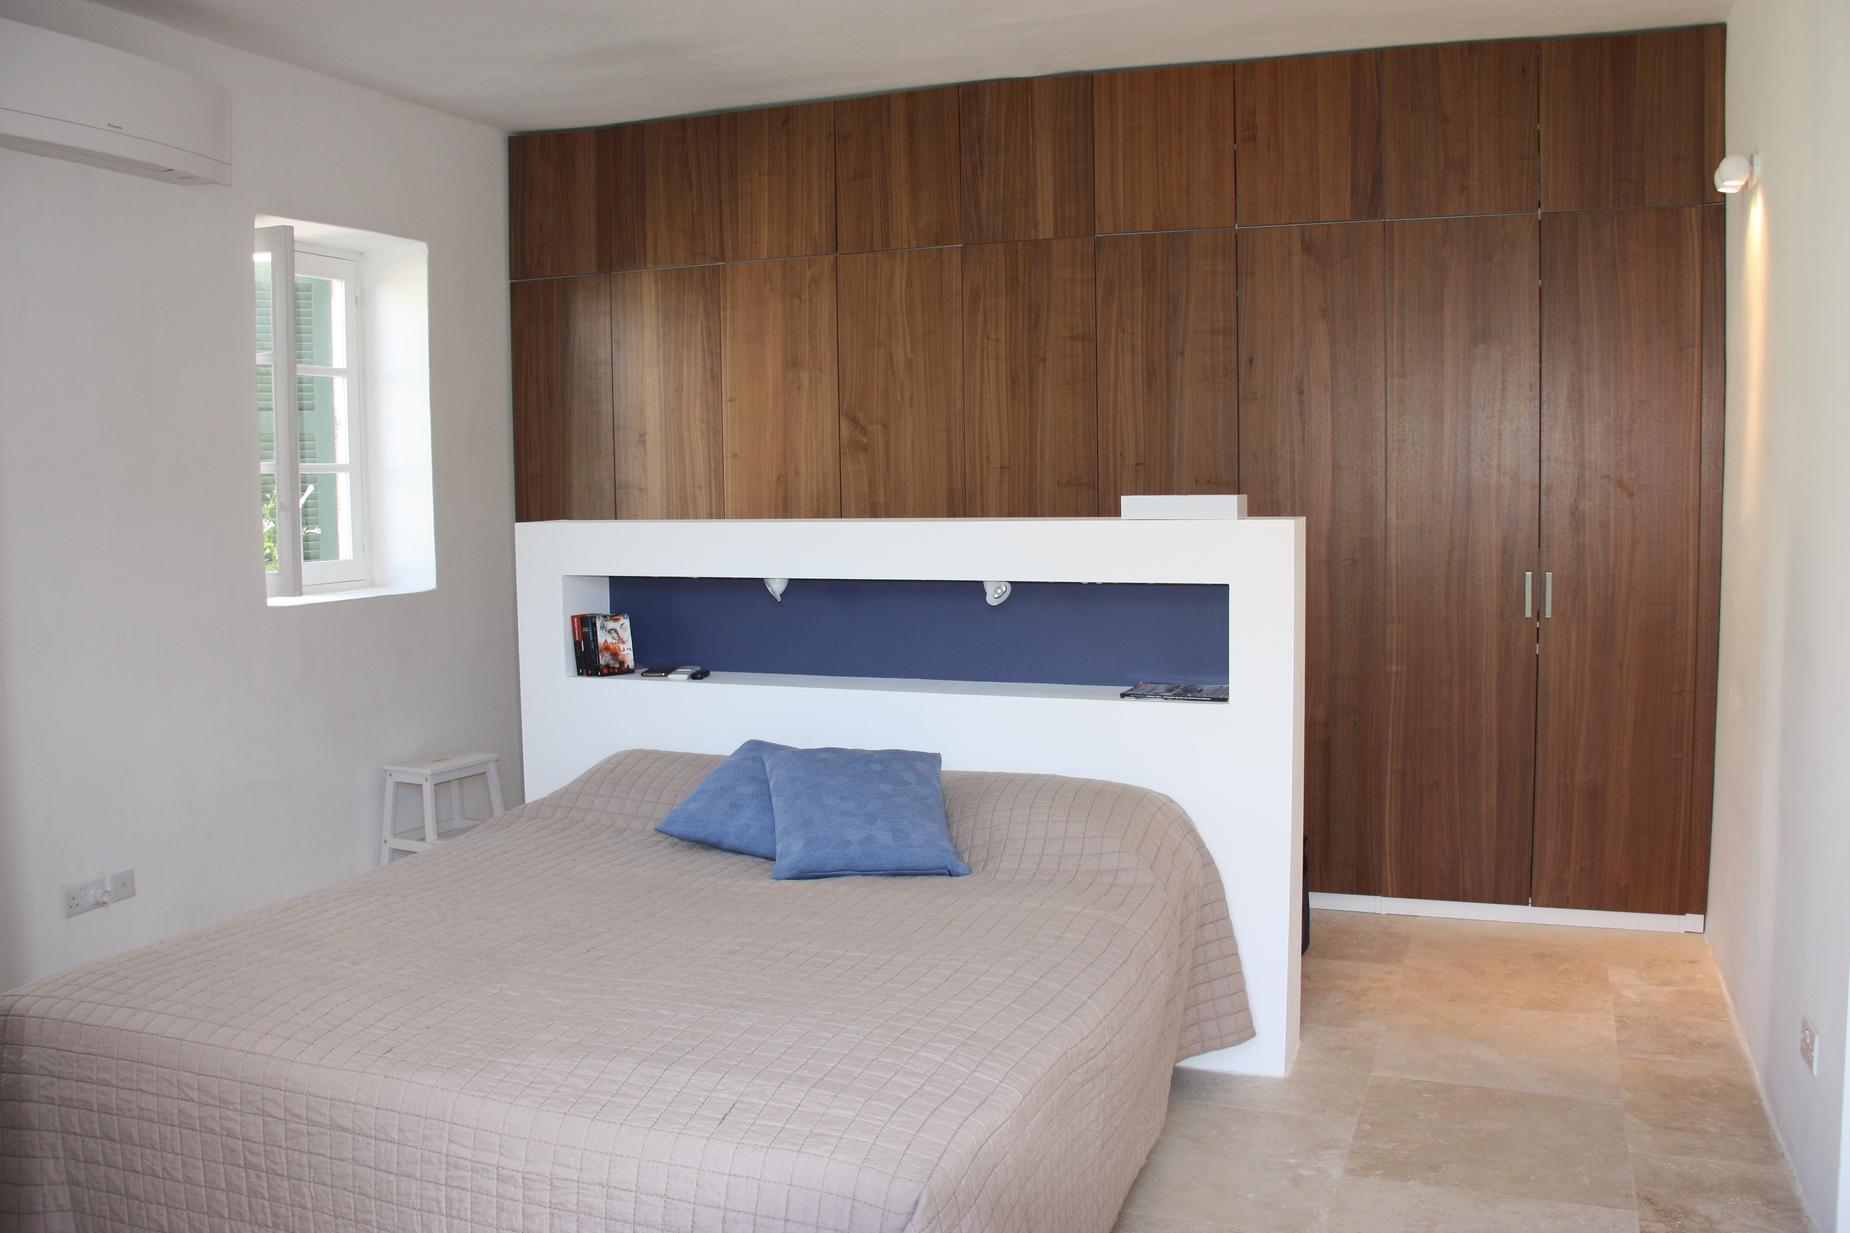 4 bed House of Character For Rent in Balzan, Balzan - thumb 6